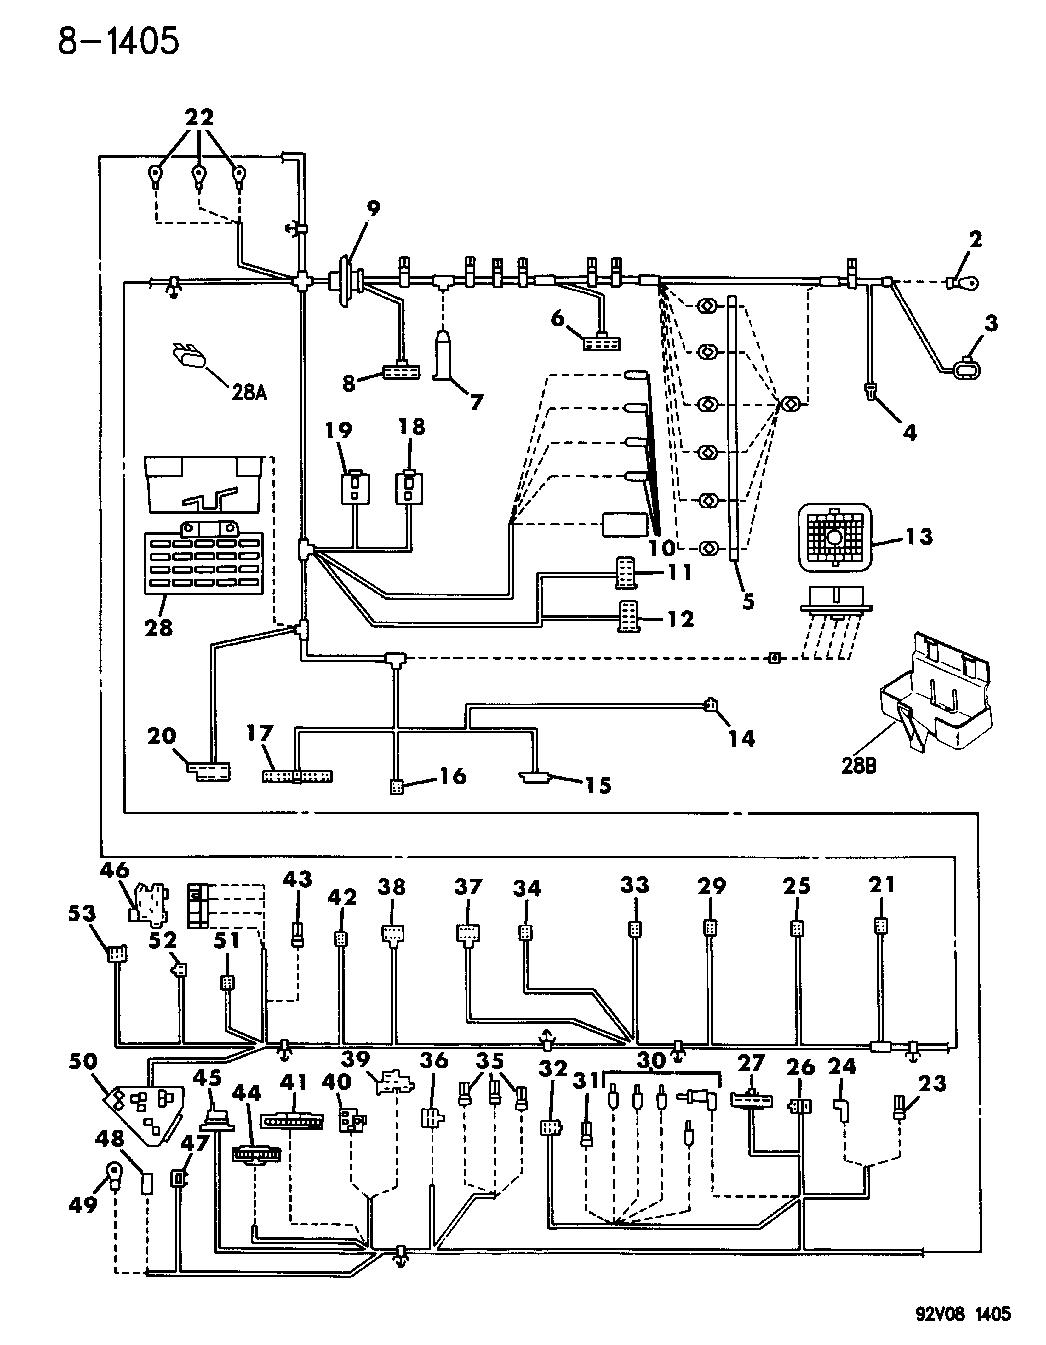 1994 Dodge Viper Wiring - Instrument Panel - Mopar Parts Giant